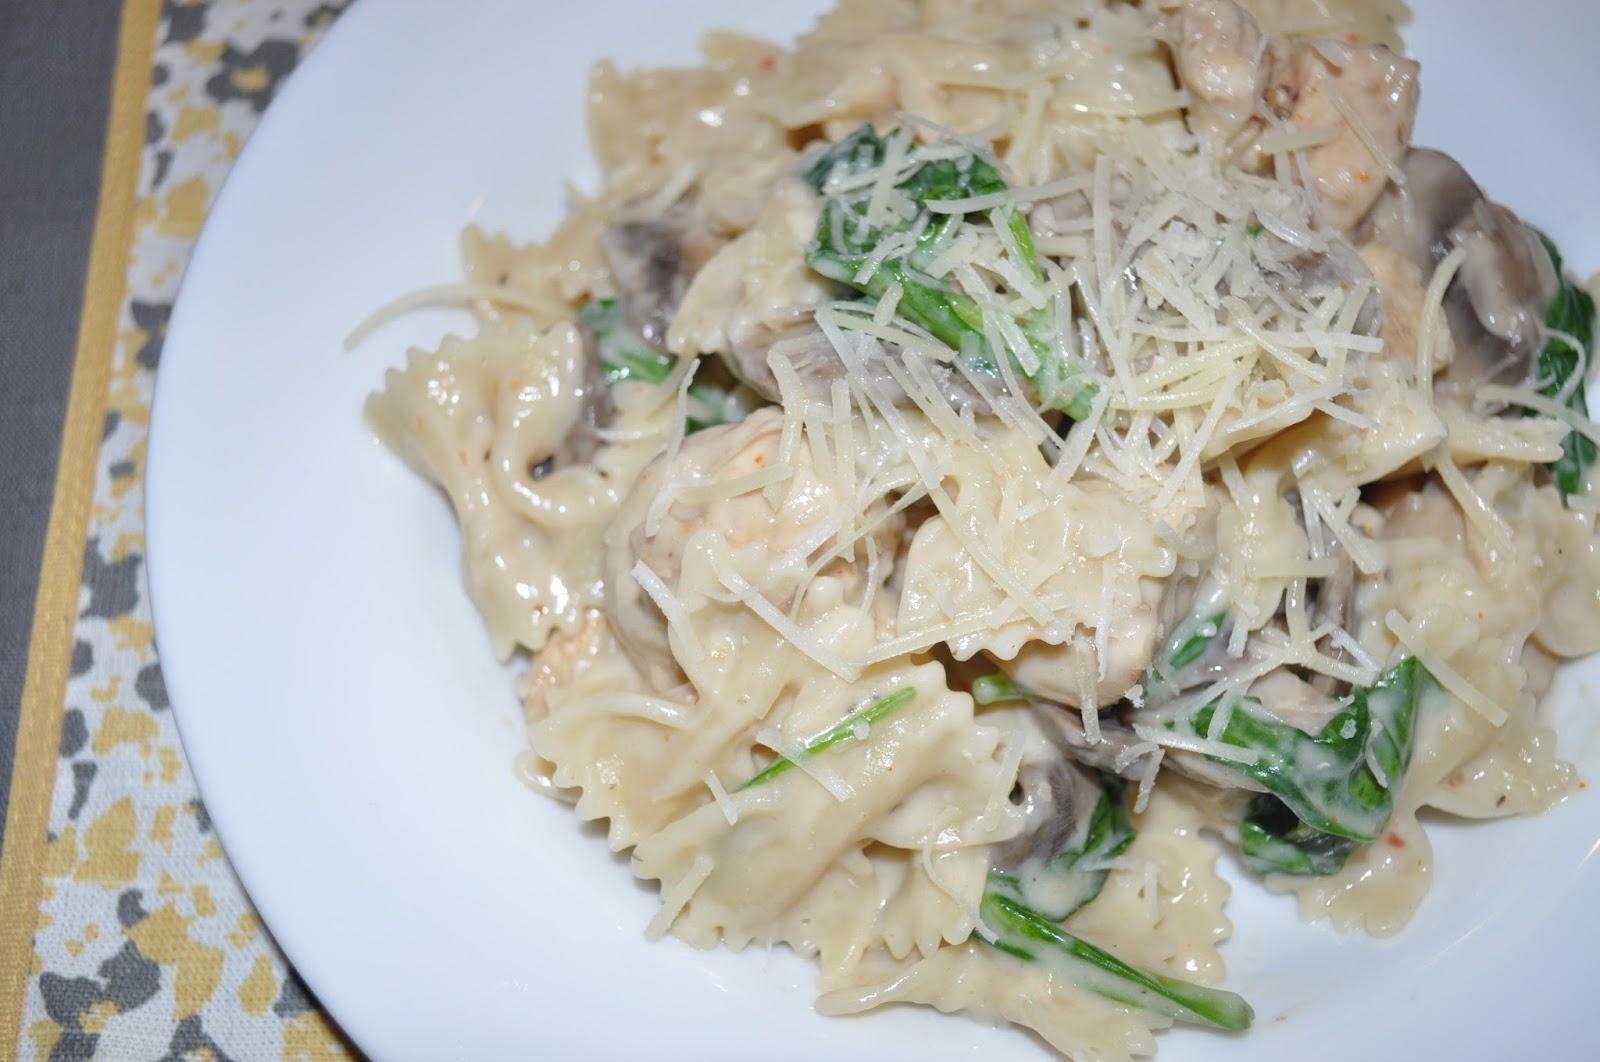 Carri Us Home: Skinny Bow Tie Chicken Mushroom Spinach Alfredo